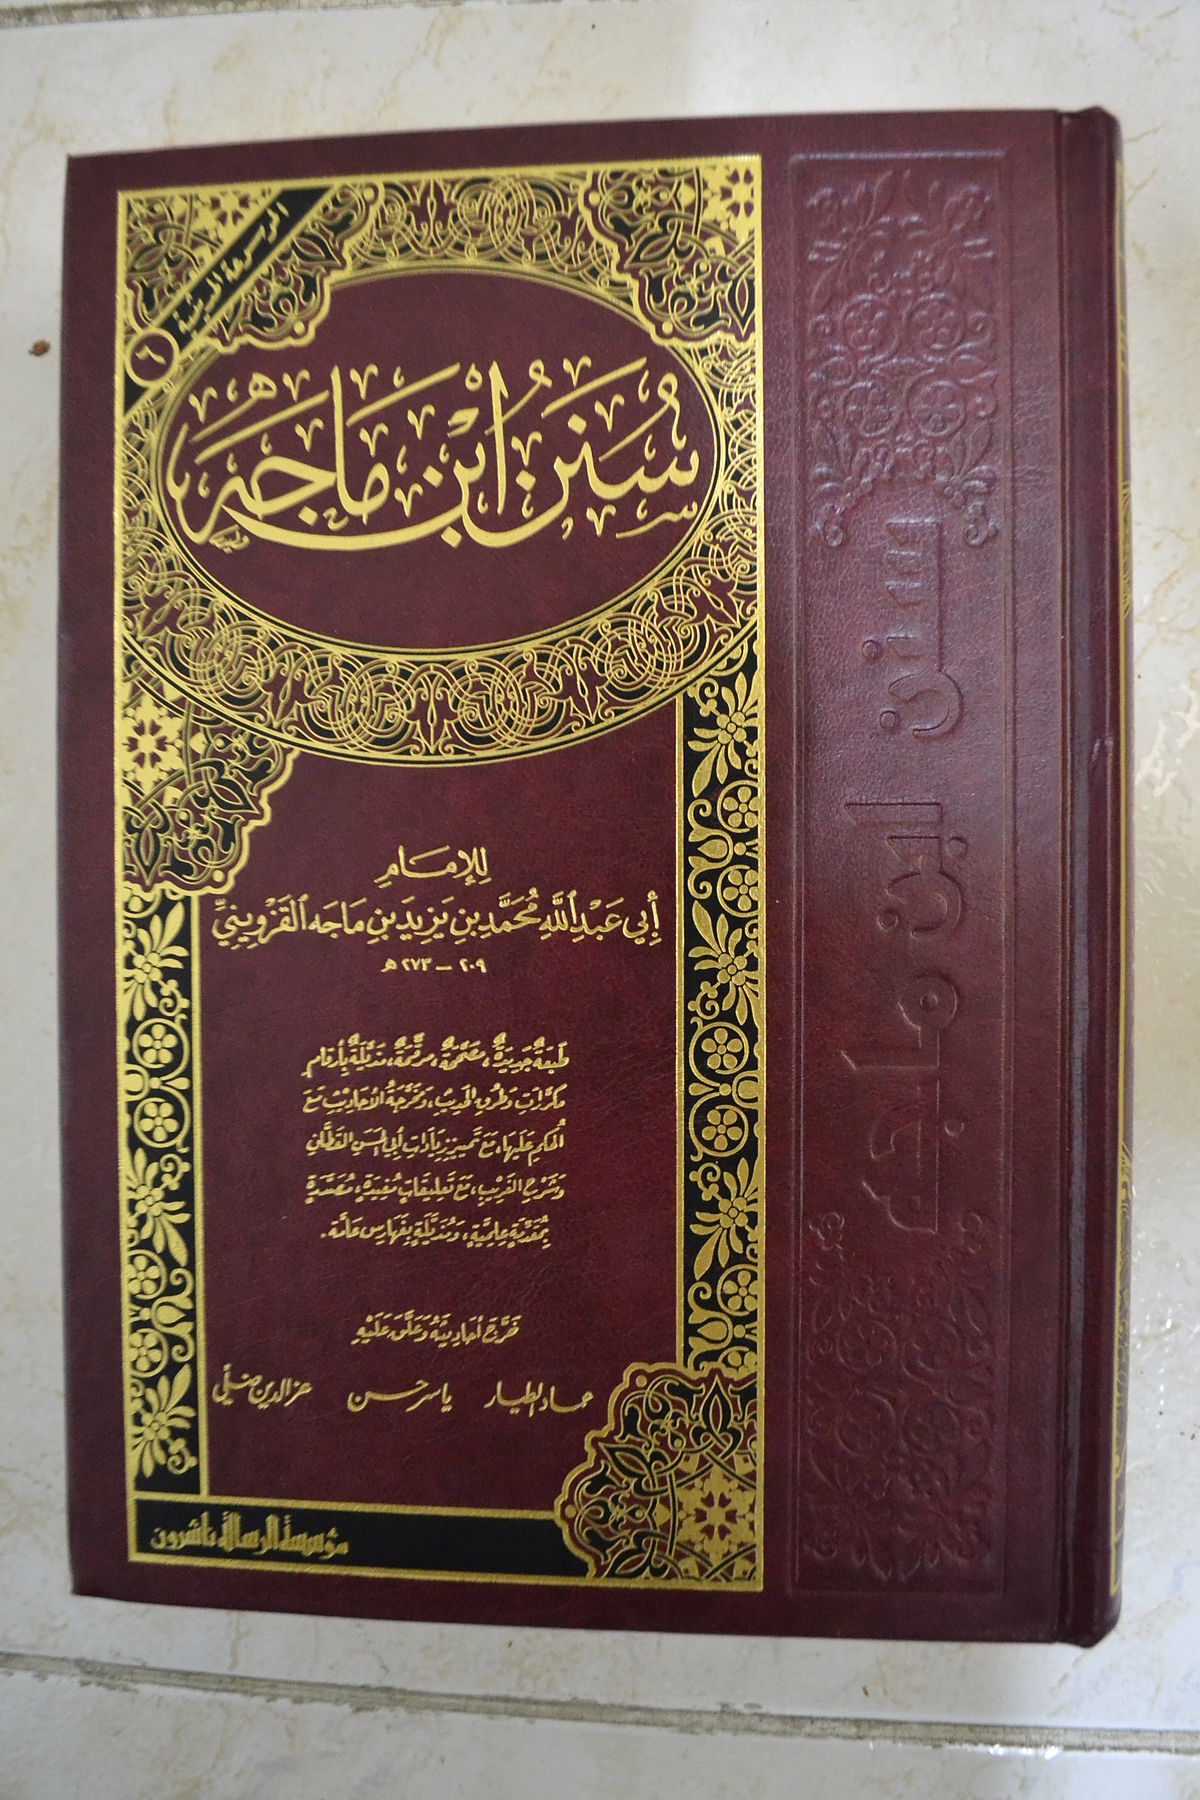 sunan ibnu majah - wikipedia bahasa indonesia